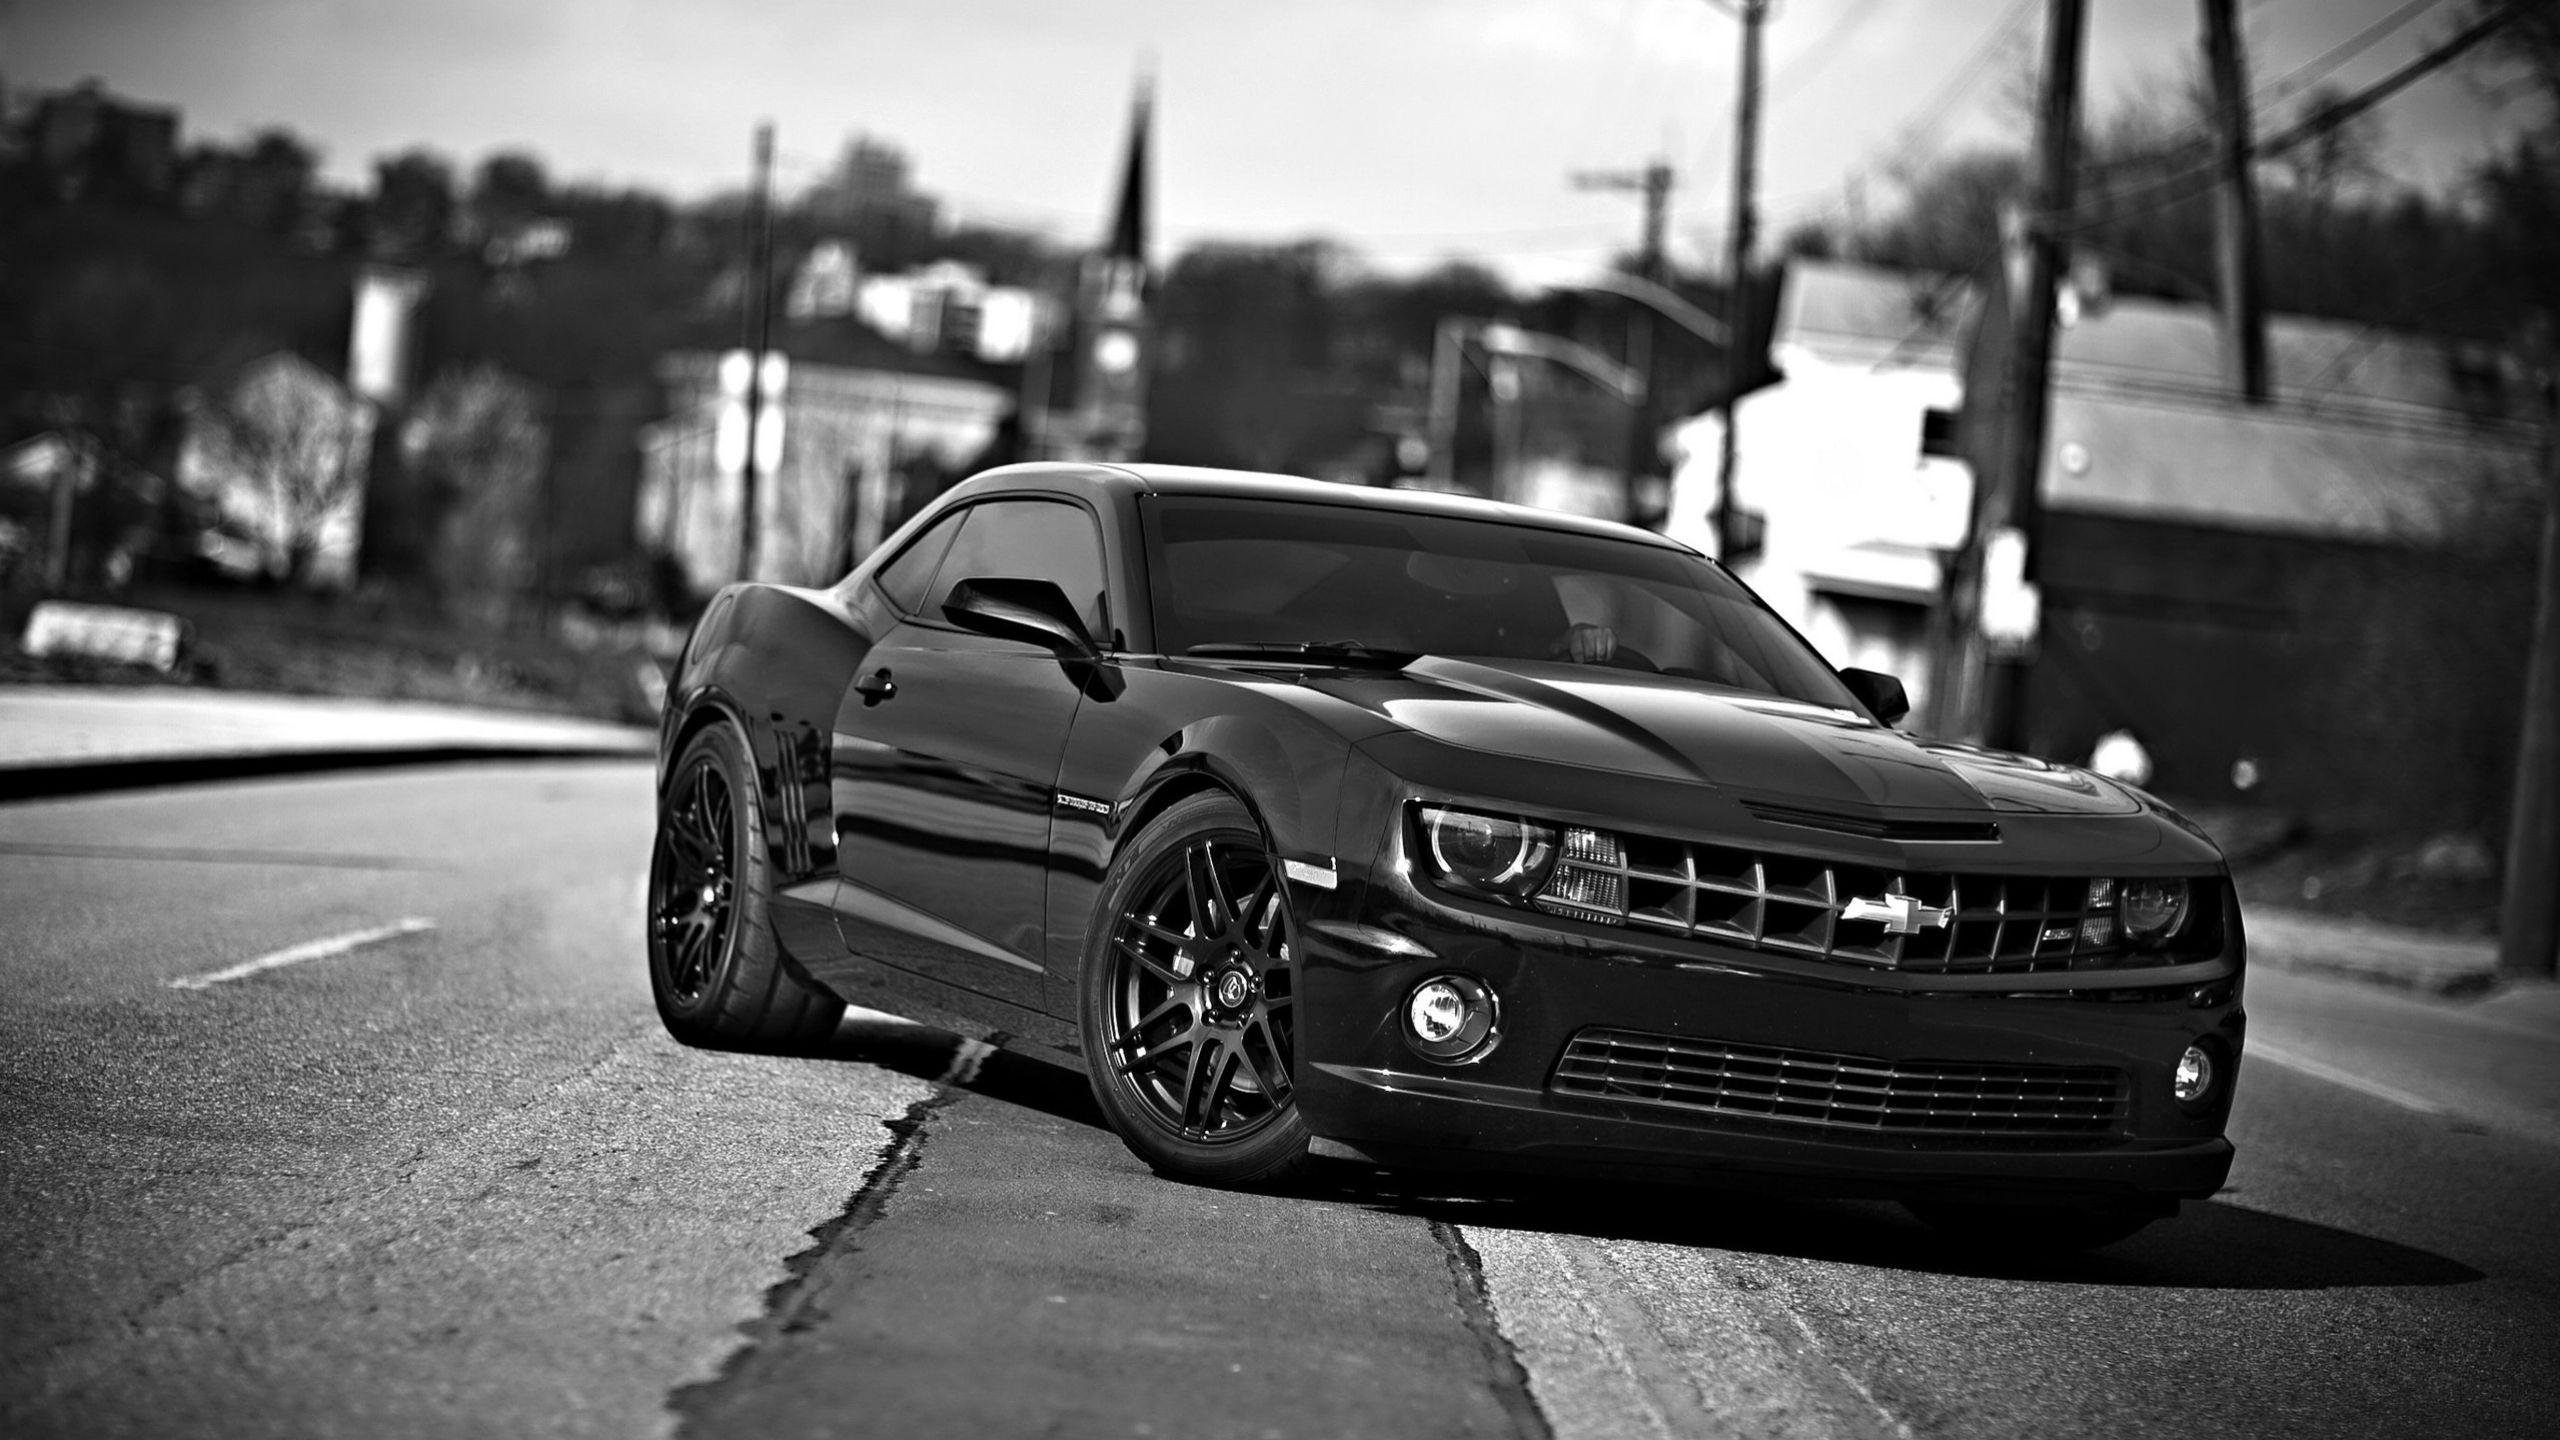 2560x1440 Wallpaper chevrolet camaro, chevrolet, cars, front view, black white